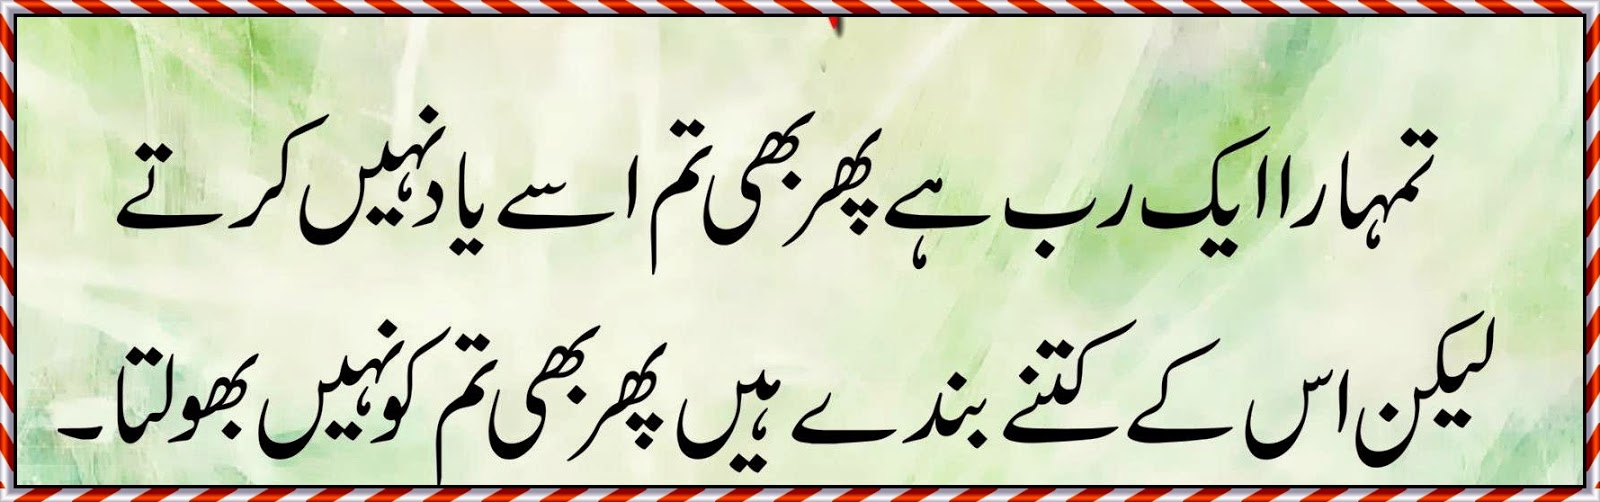 Islamice SMS Shayari In Urdu